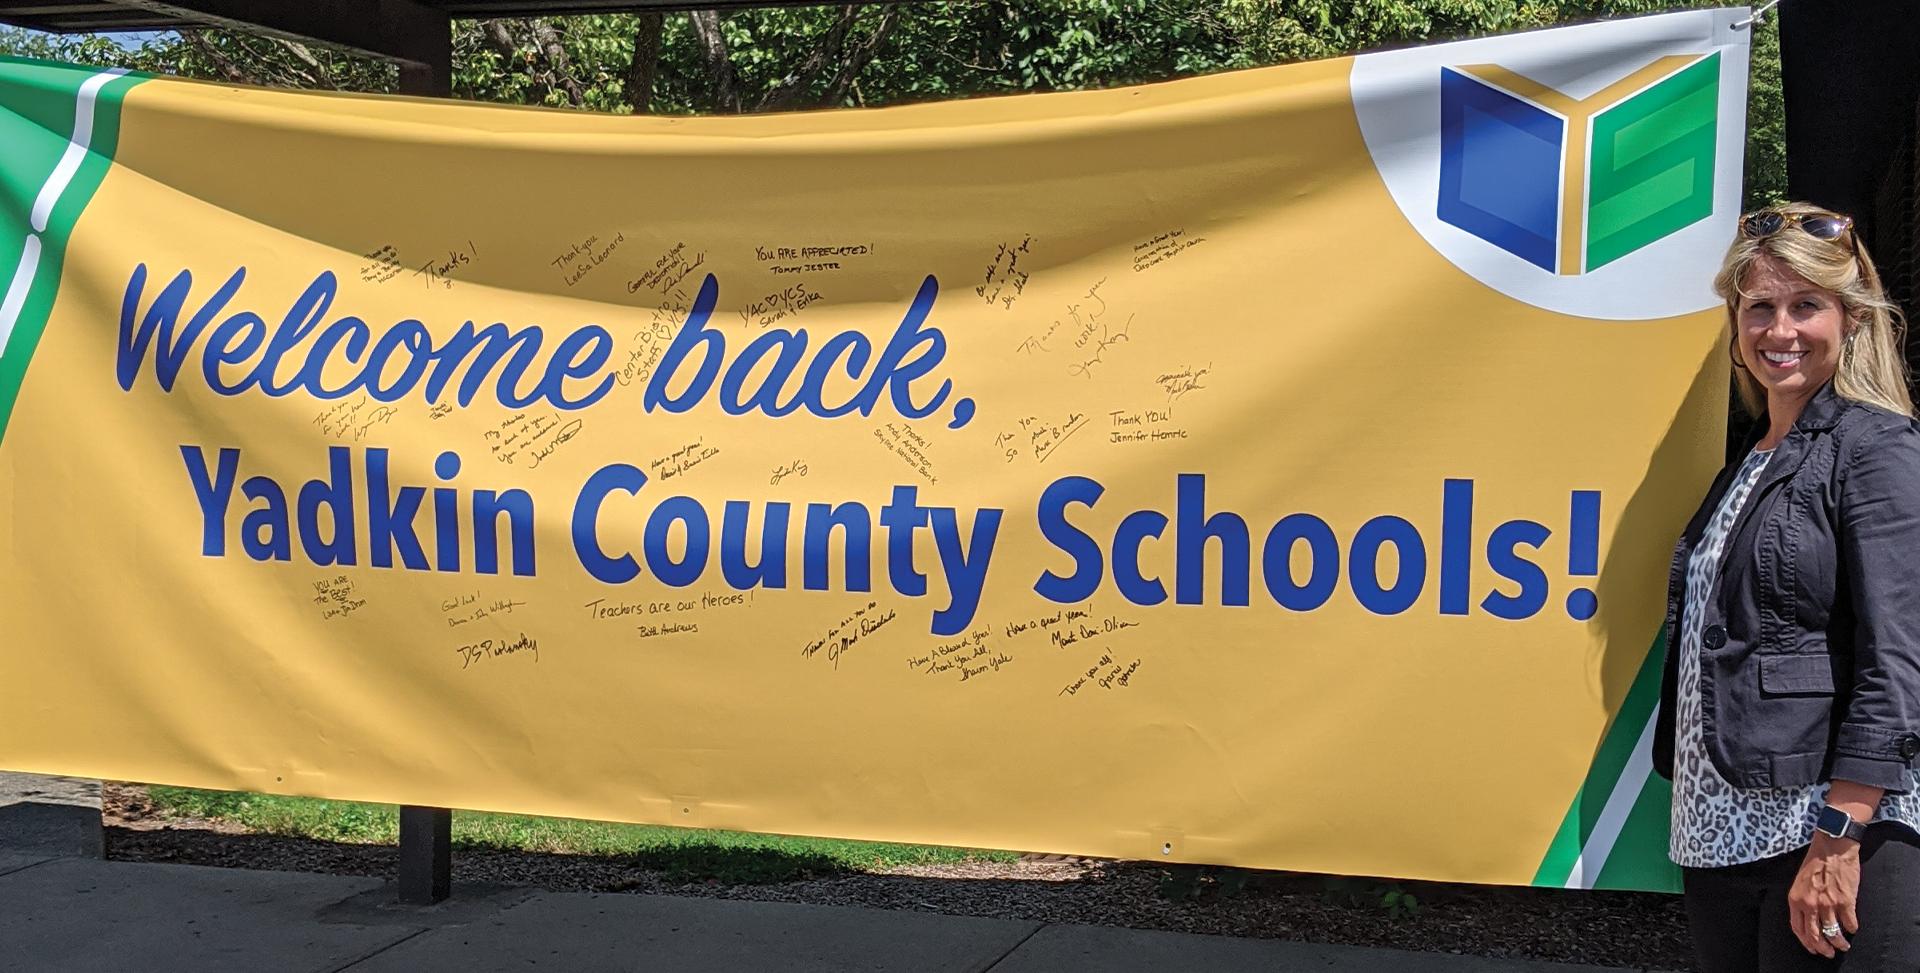 Welcome Back Yadkin County Schools banner on display.